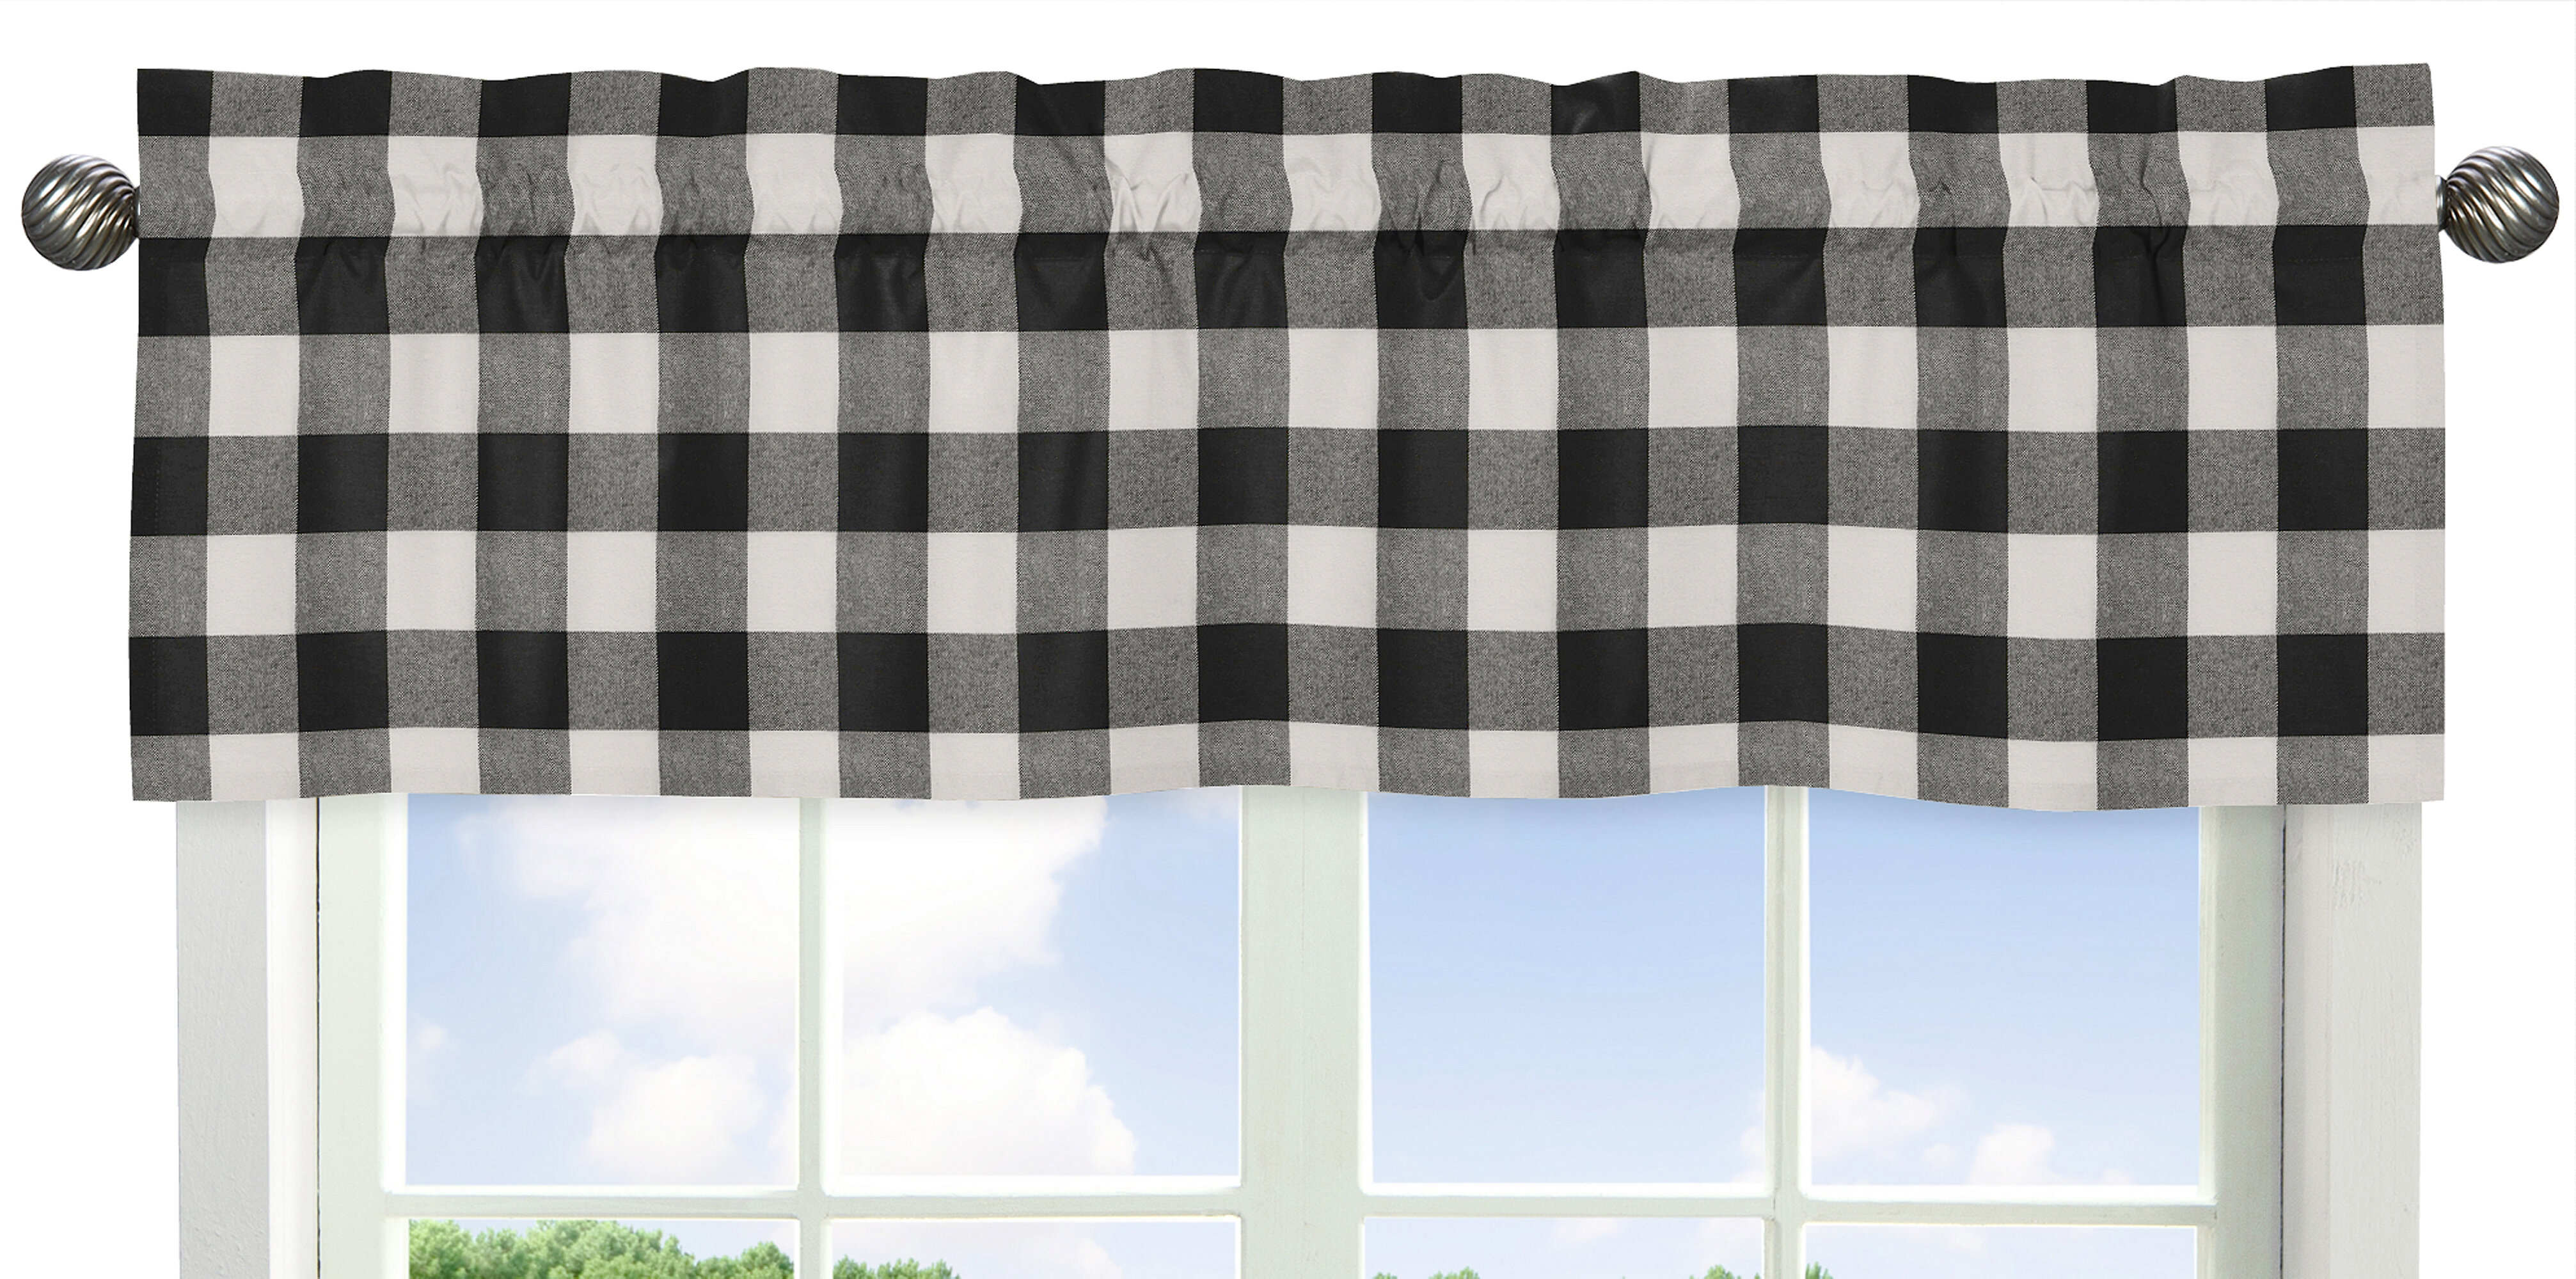 Home Kitchen Black And White Buffalo Checks Farmhouse Curtain Valance Handmade Products Avmc Edu In